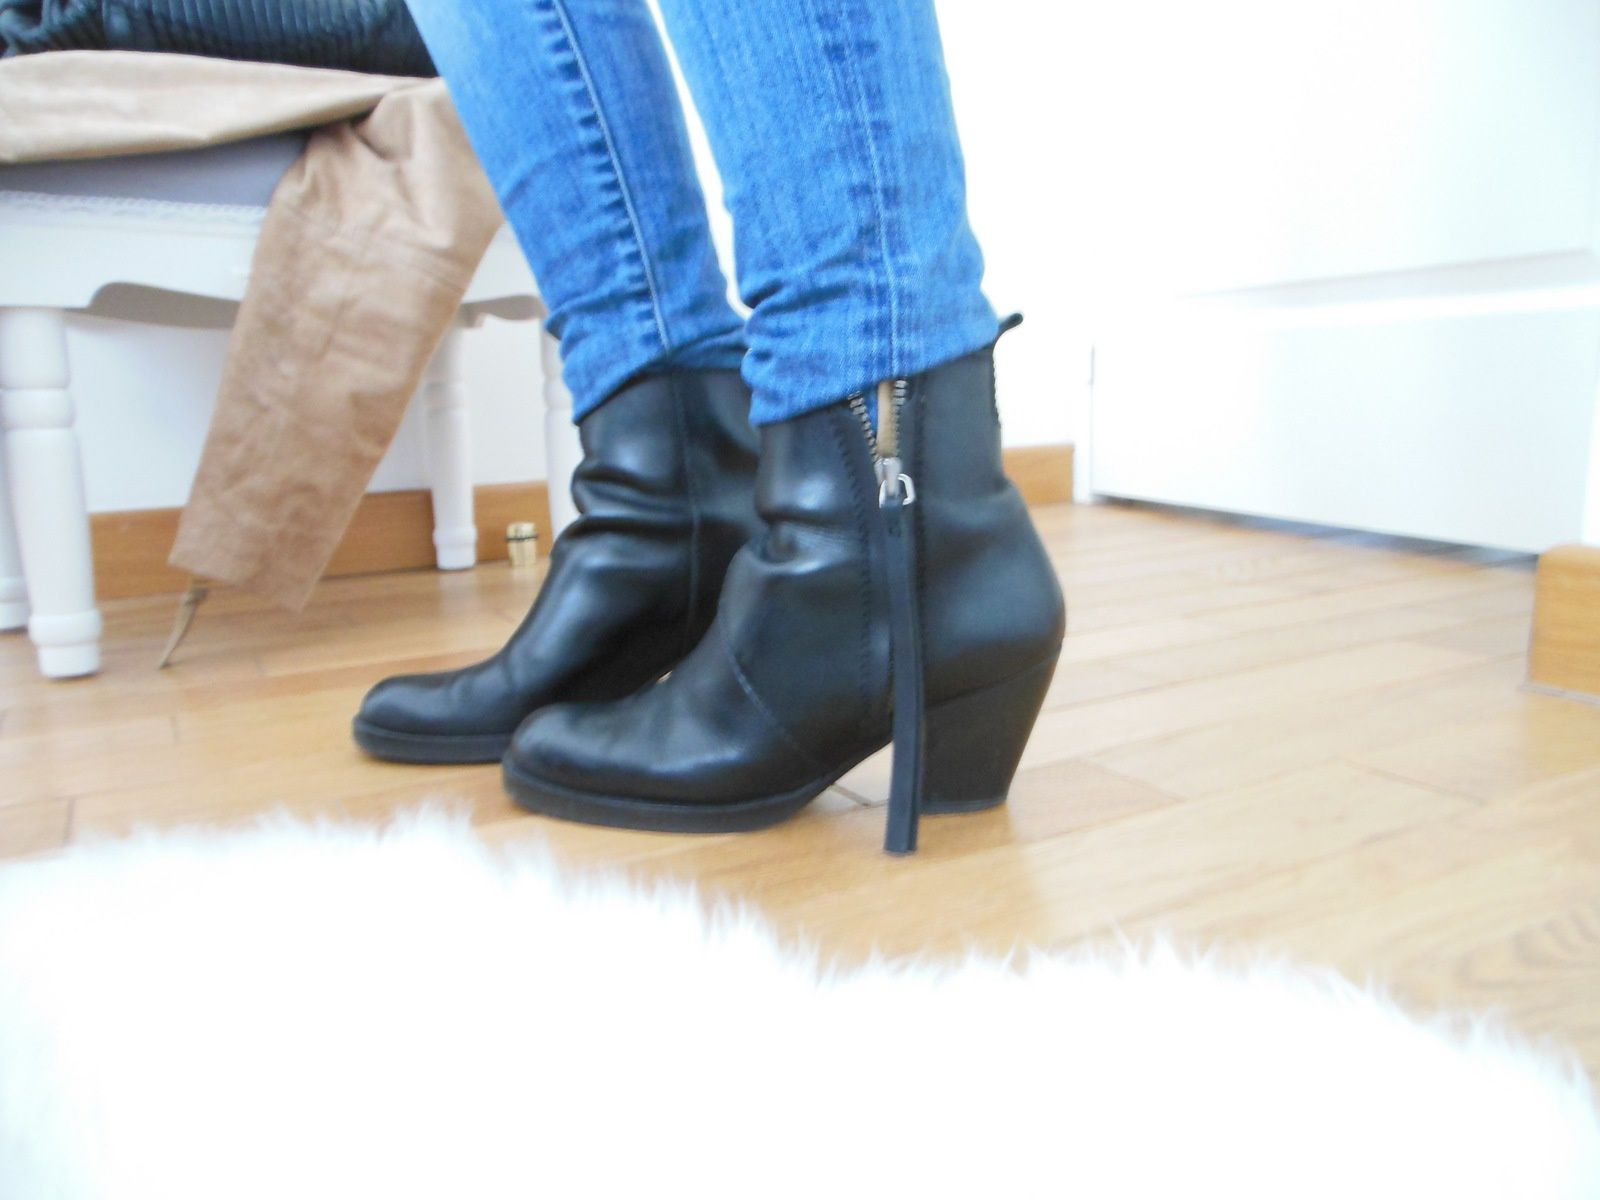 Perfecto - Mango // Pull - Kookai // Jeans - Zara // Pistol Boots - Acne Studios // Sac - Coach